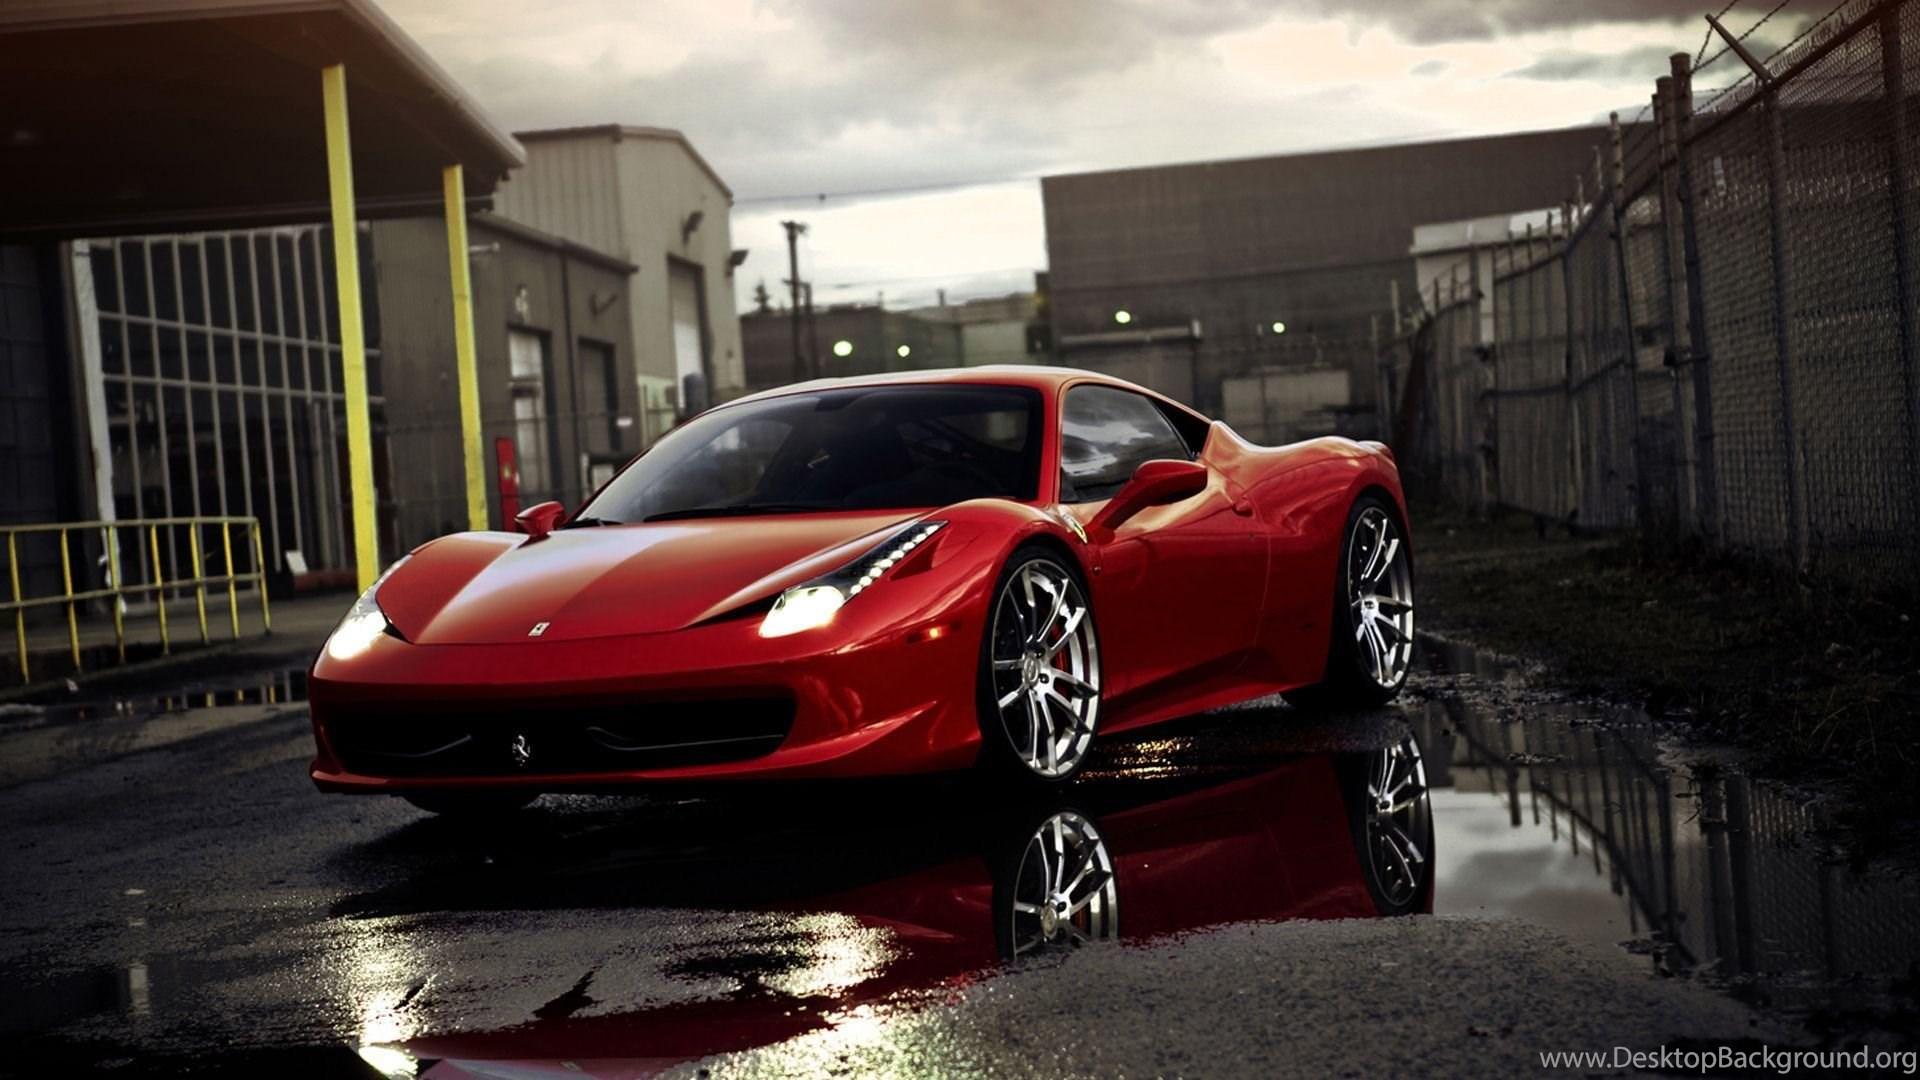 Ferrari 458 Italia Wallpapers Hd Best Hd Wallpapers Desktop Background